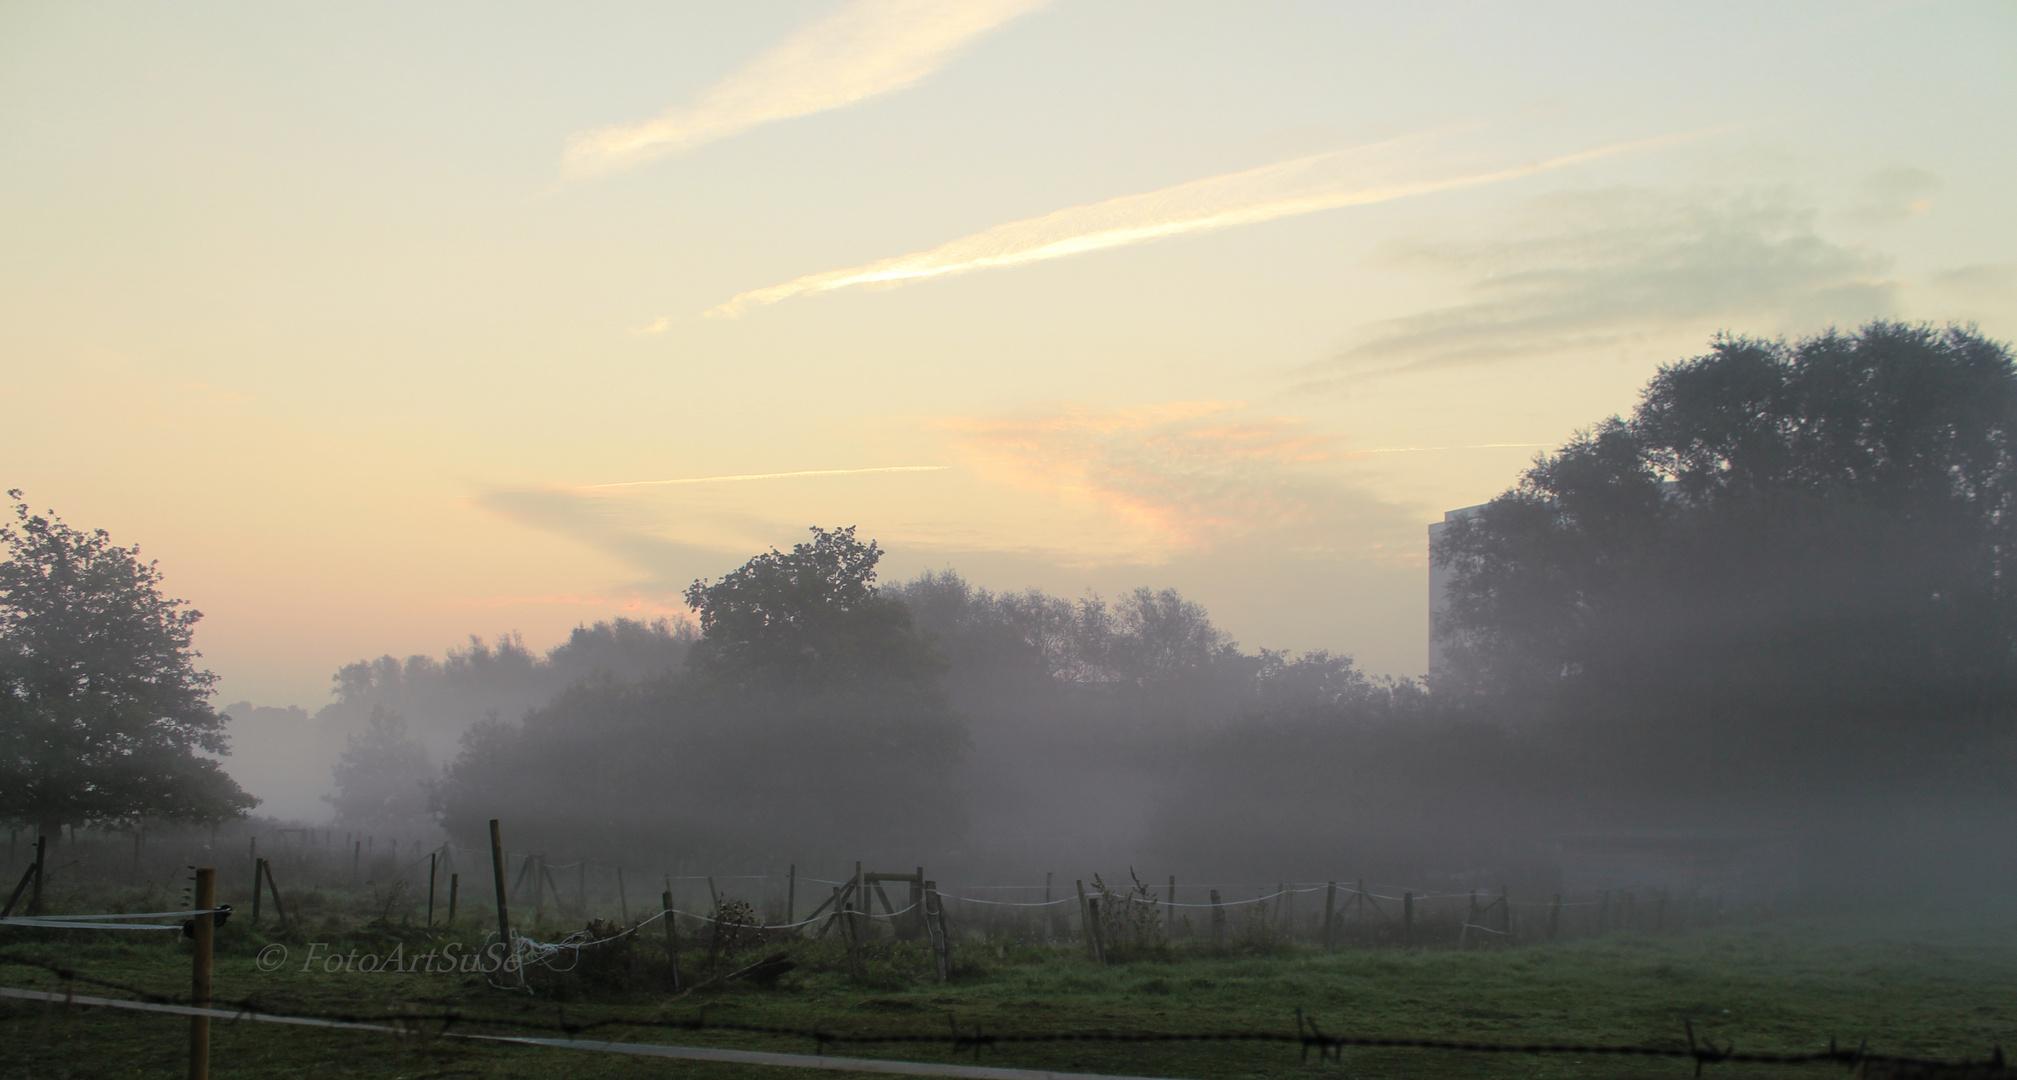 Septembermorgen 2